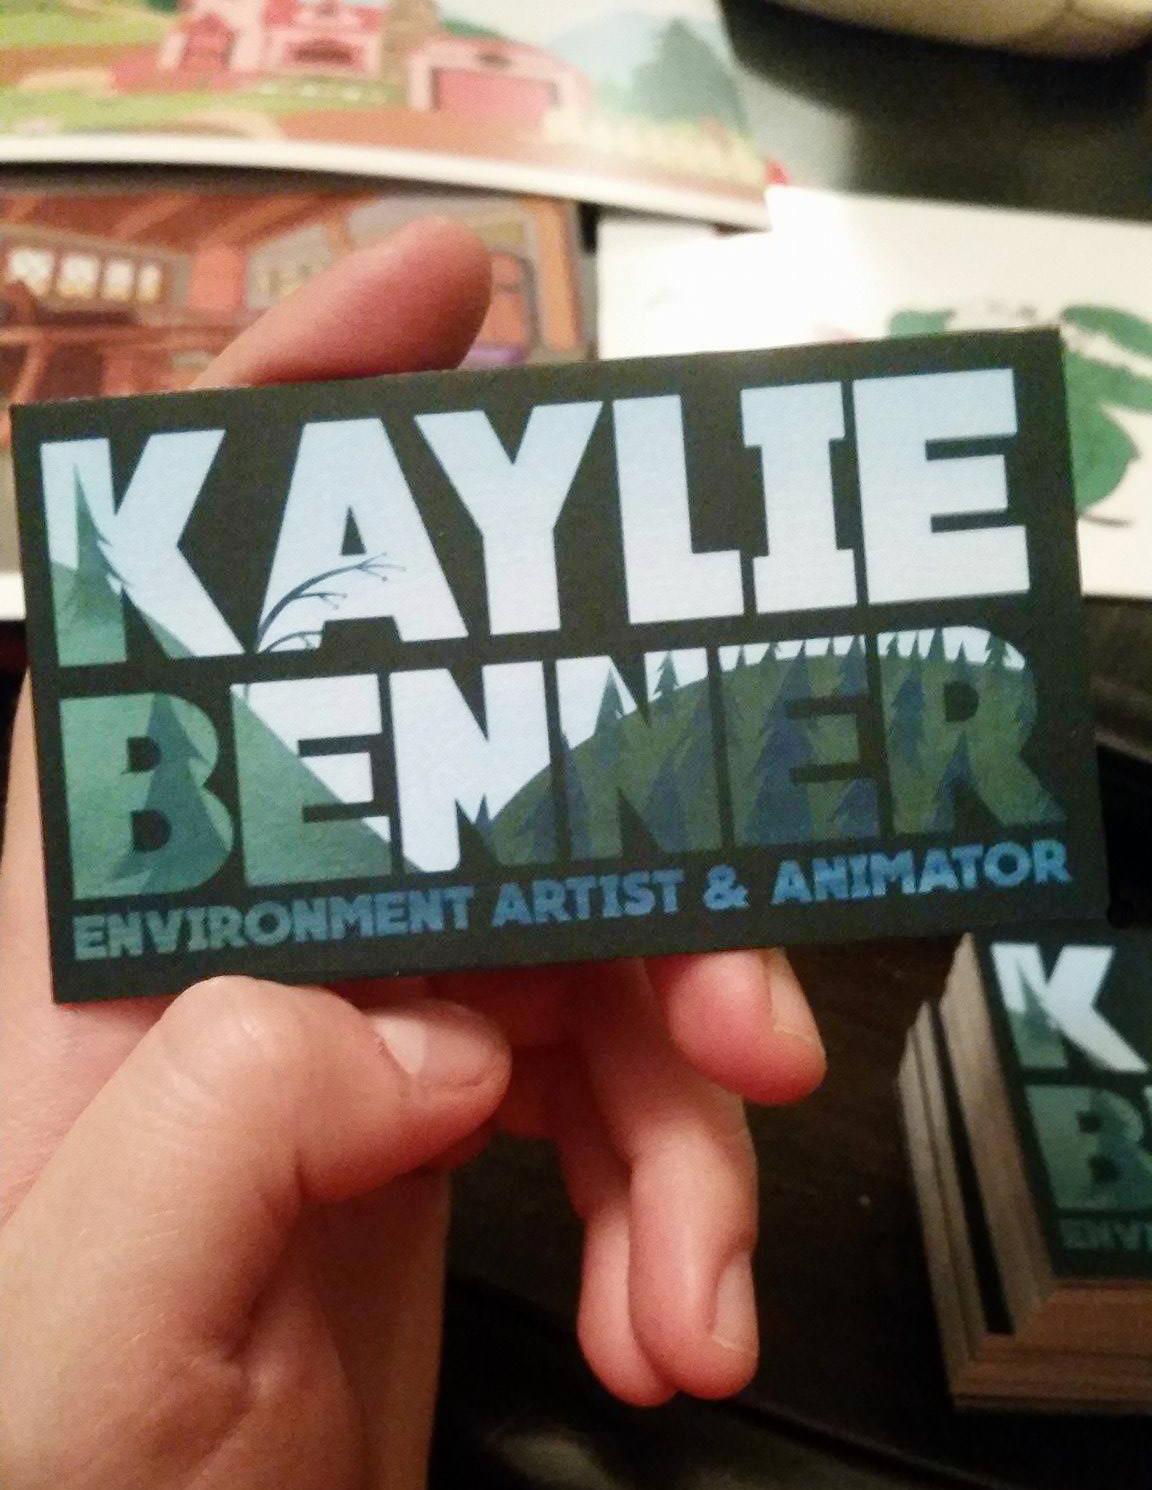 Kaylie benner holding card